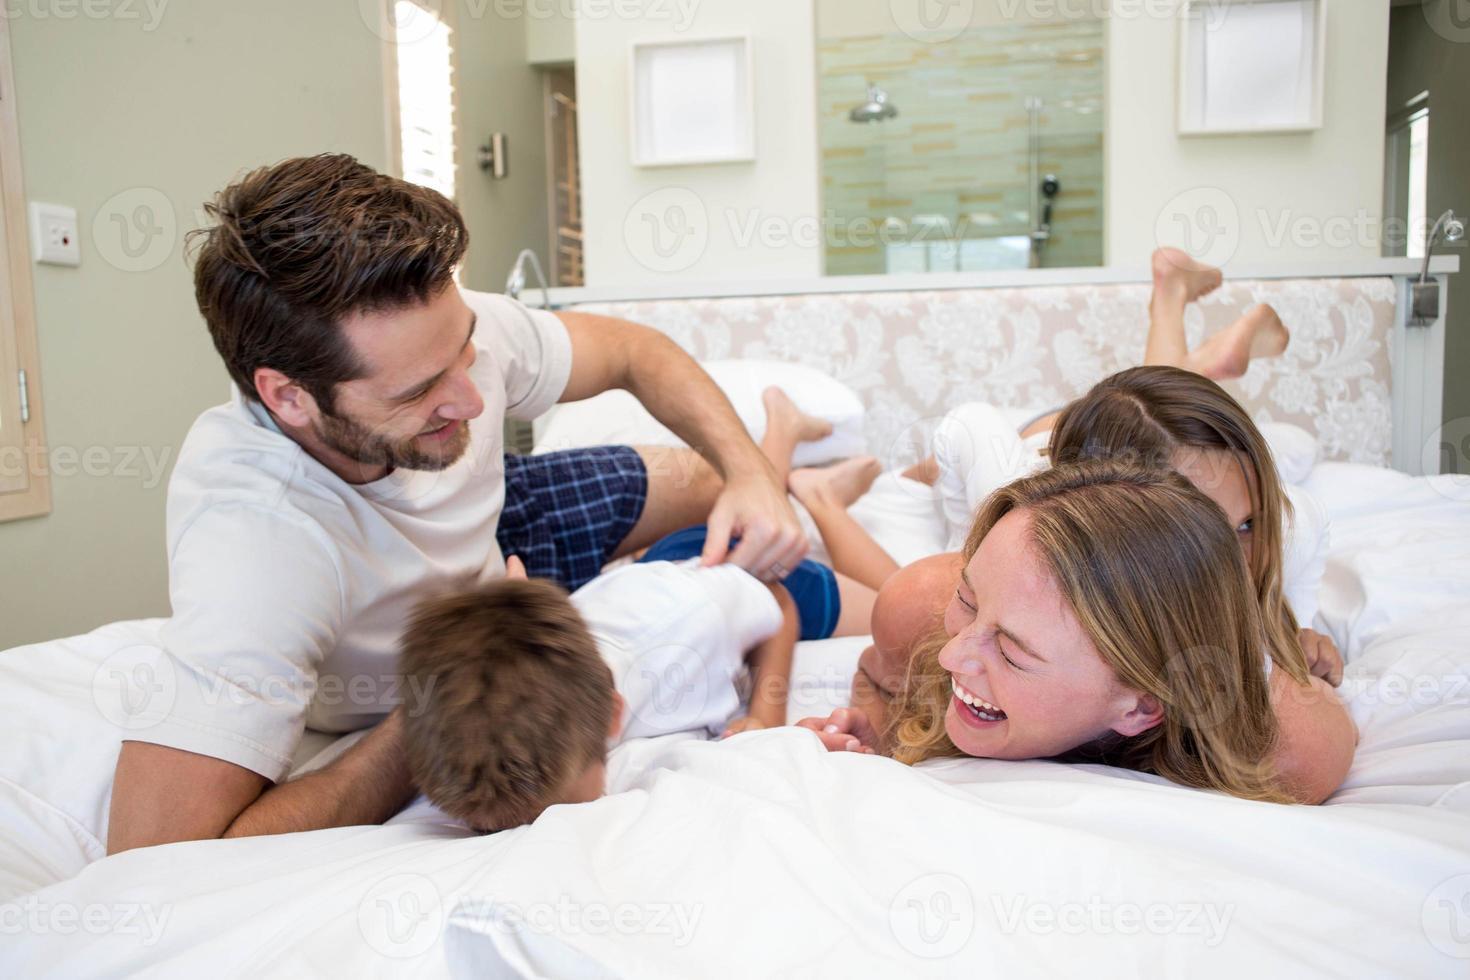 família feliz brincando na cama foto